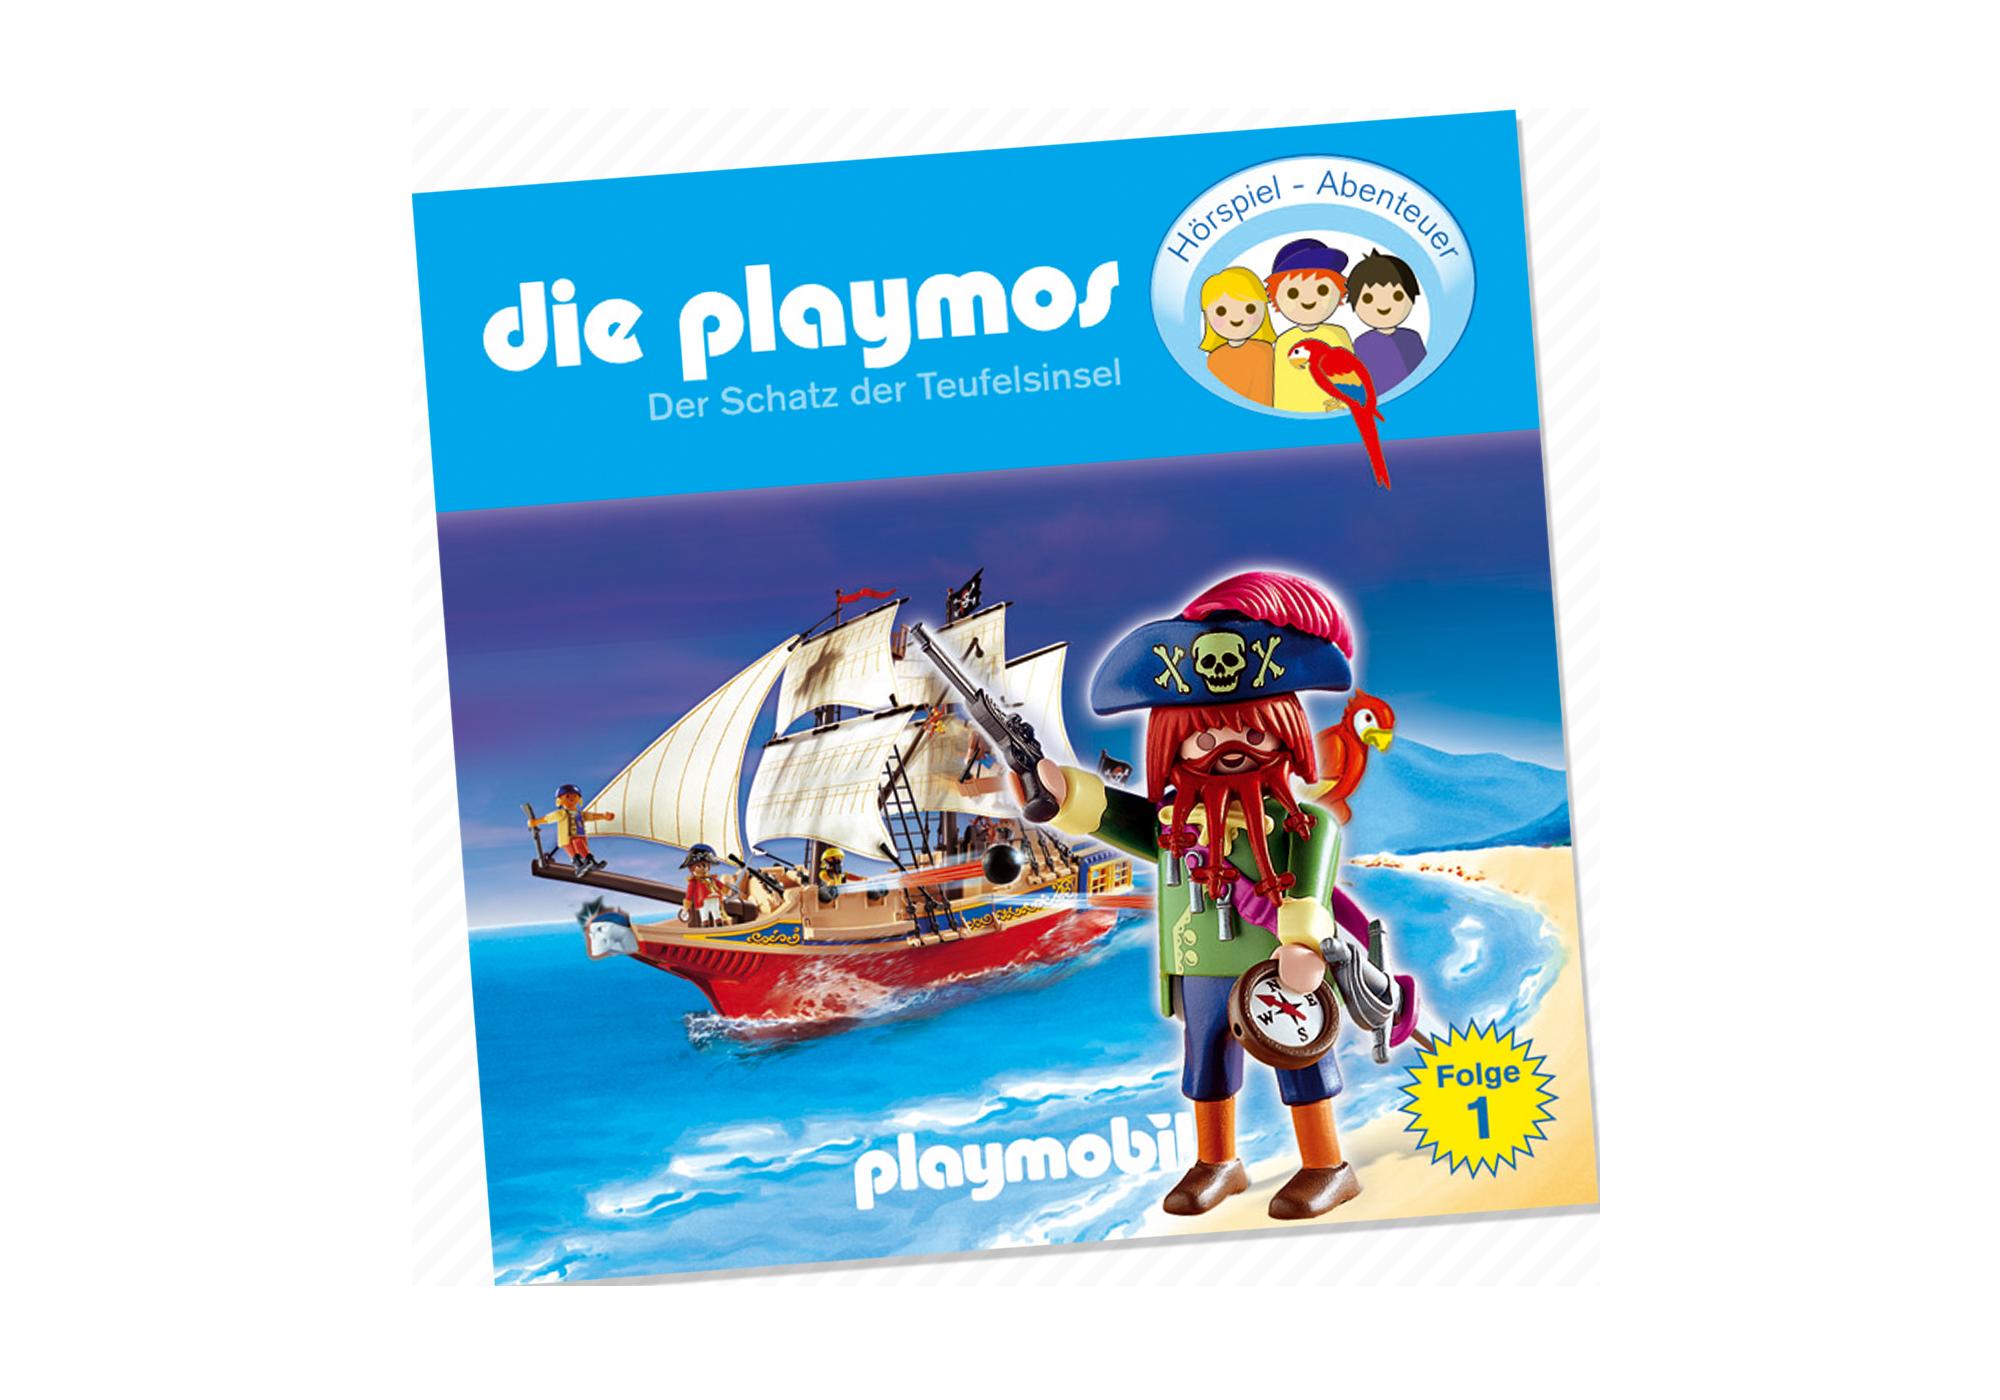 http://media.playmobil.com/i/playmobil/80128_product_detail